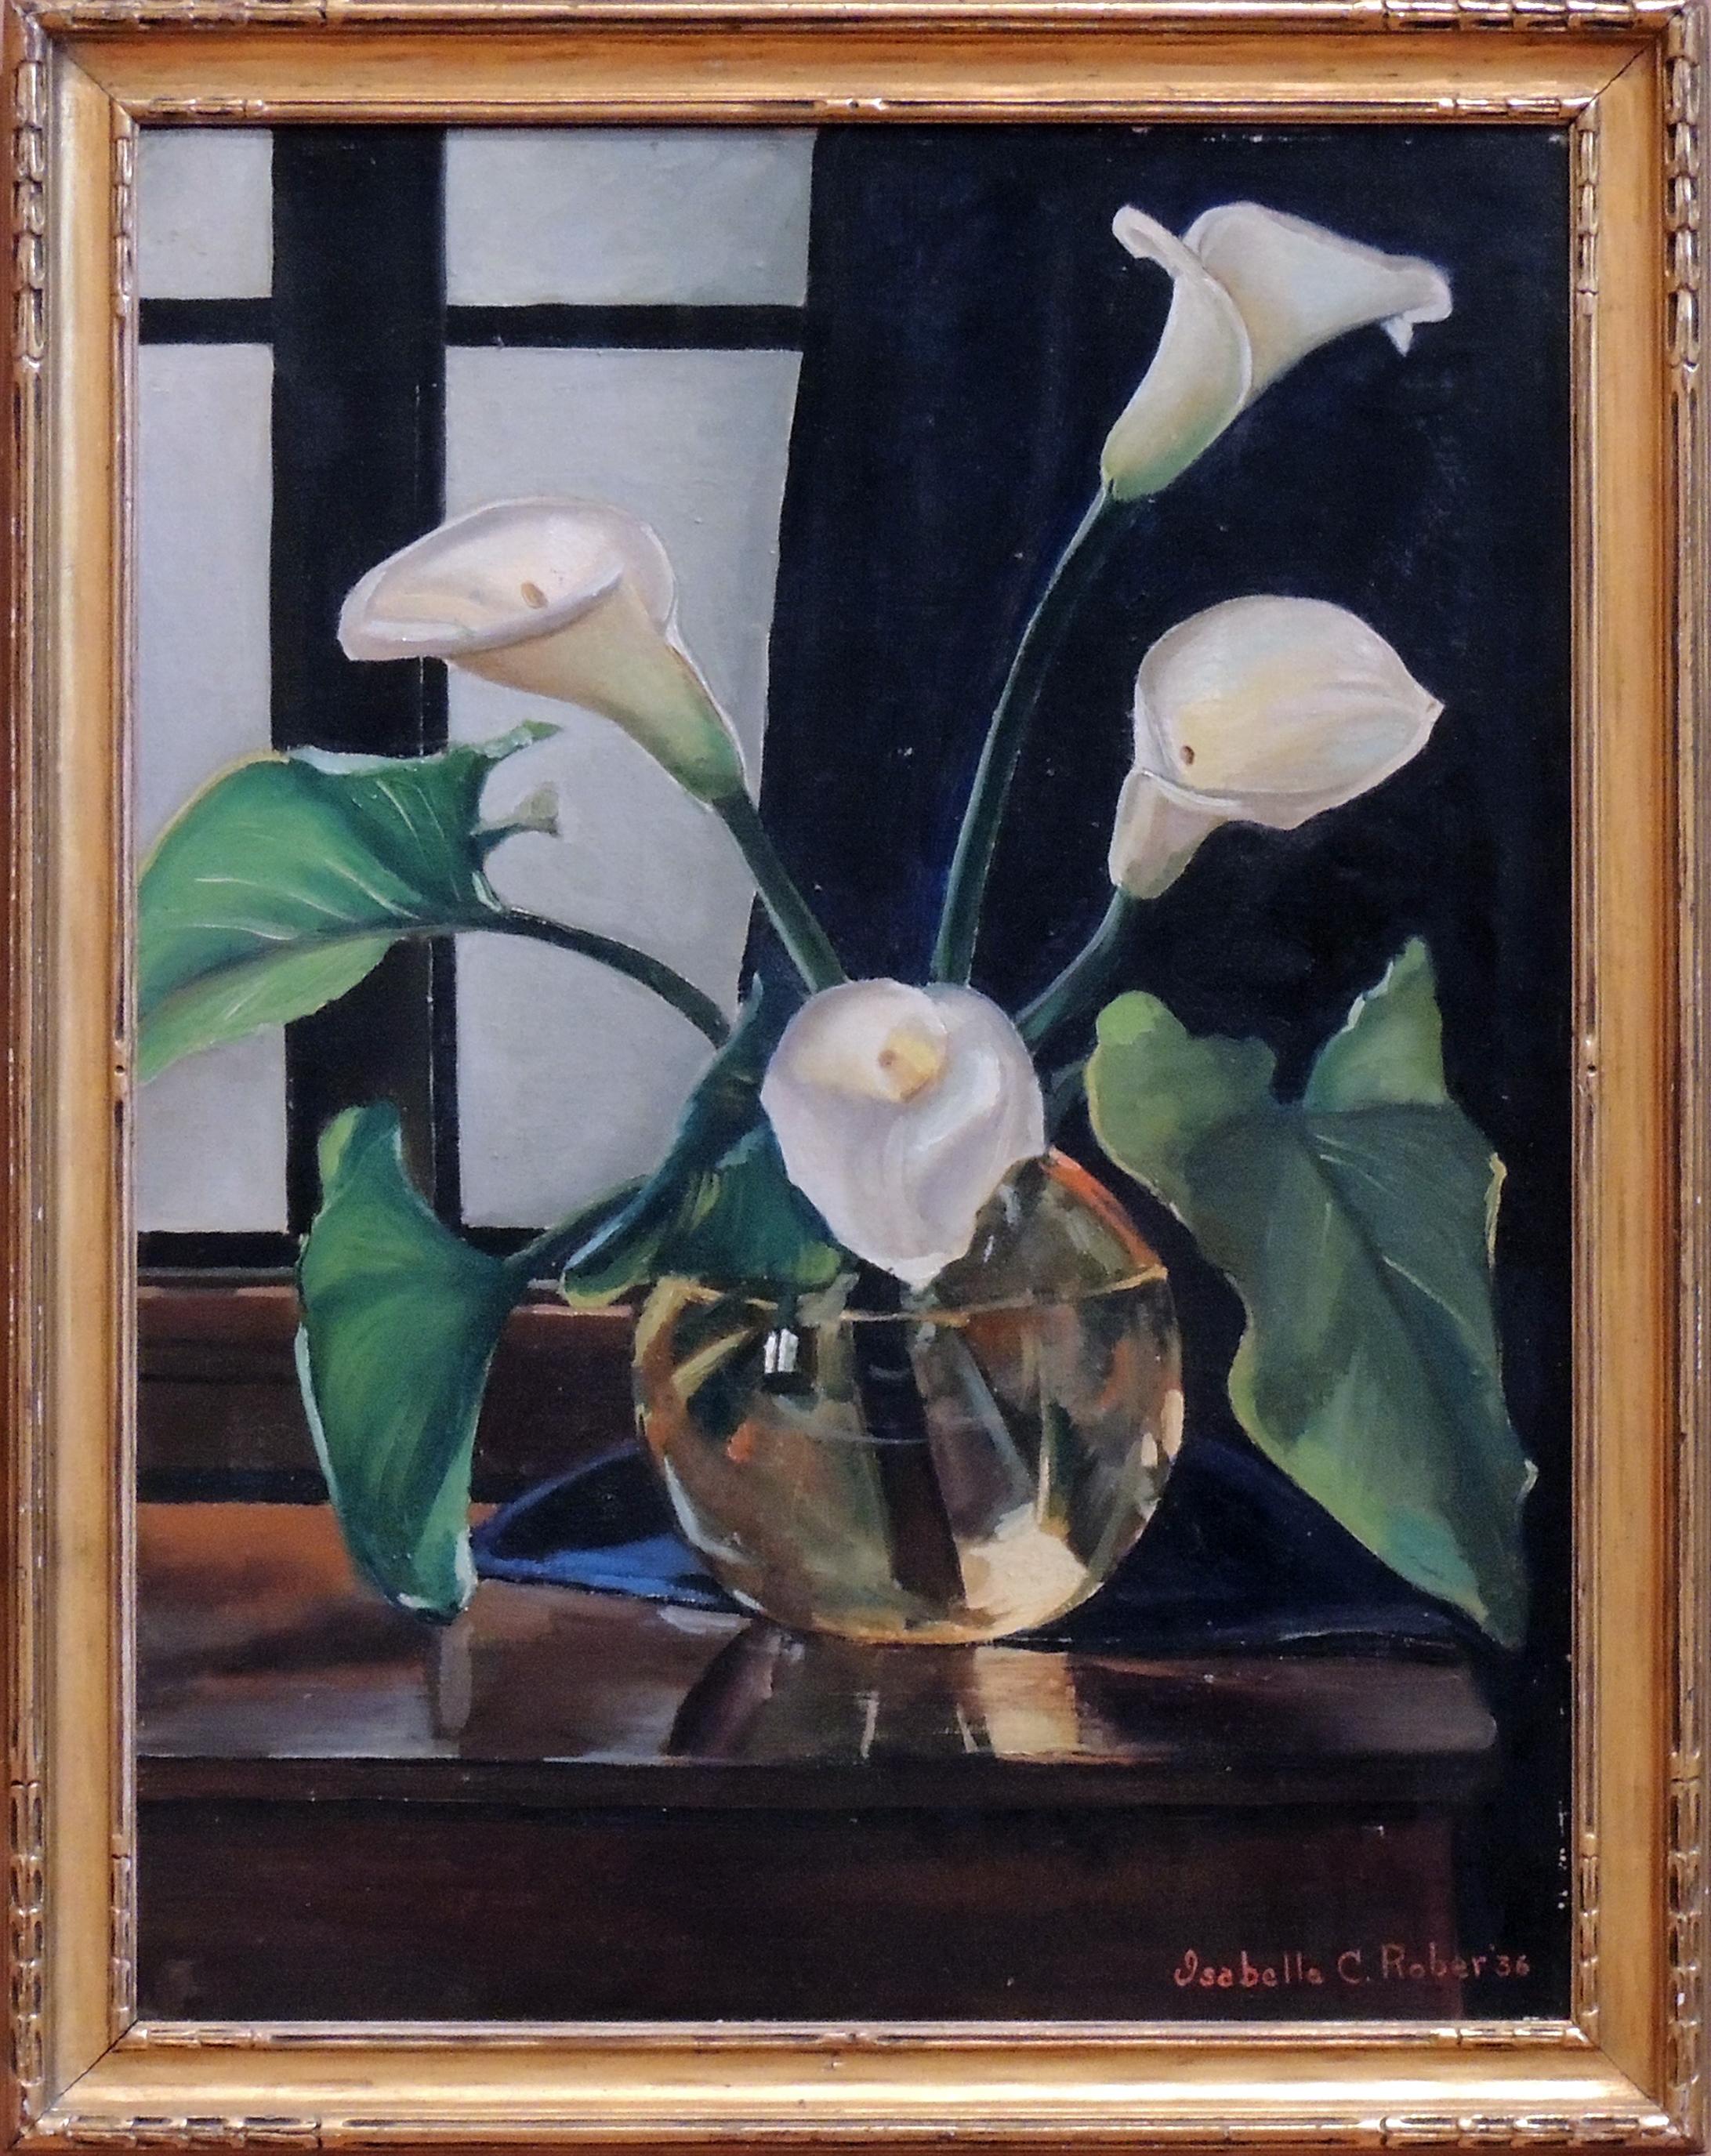 "1986.147 | Isabella Chittenden Rober | CALLA LILIES | oil on canvas | 24 x 18"" | 1936 | Gift of Mrs. Preston Crabill"